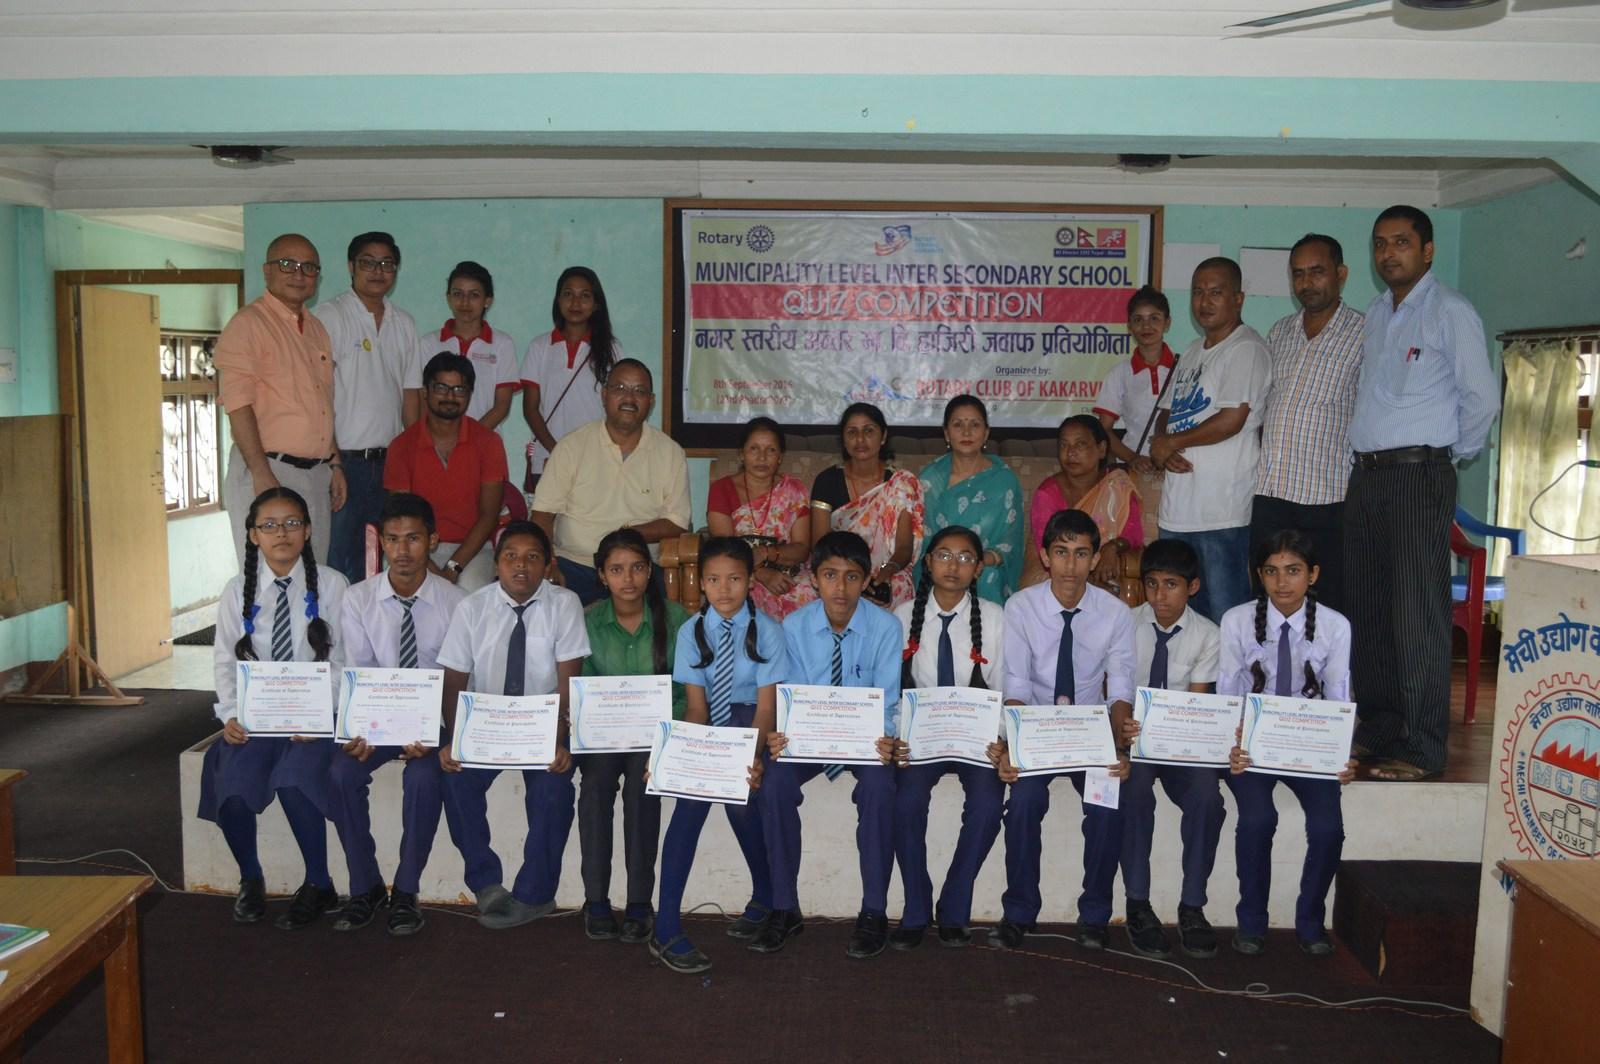 Municipality-Level-Inter-Secondary-School-Quiz-Contest-2016-Rotary-Club-of-Kakarvitta-70